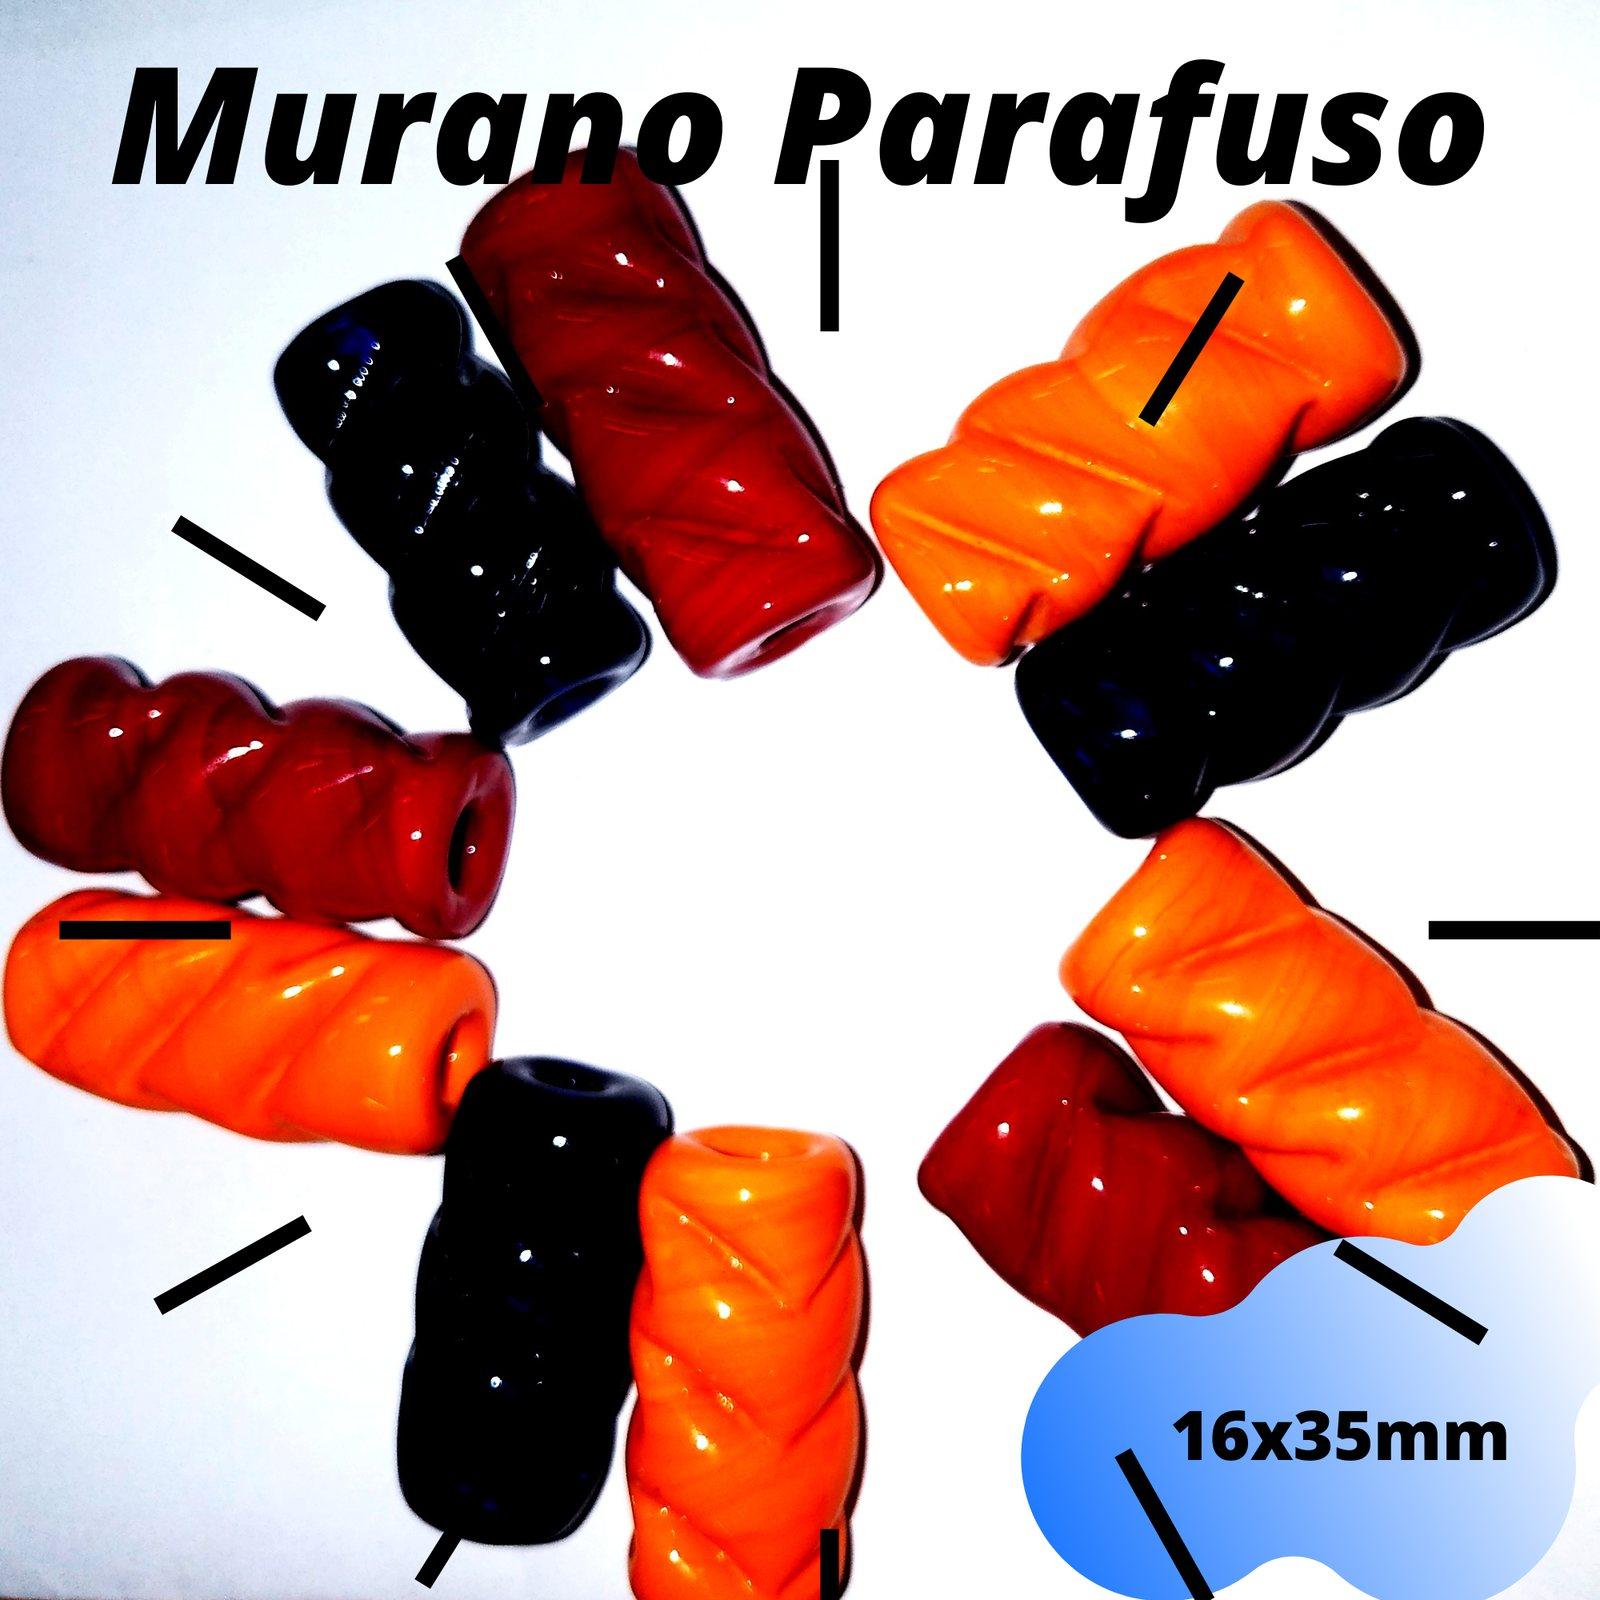 Murano Parafuso Passante 16x35mm